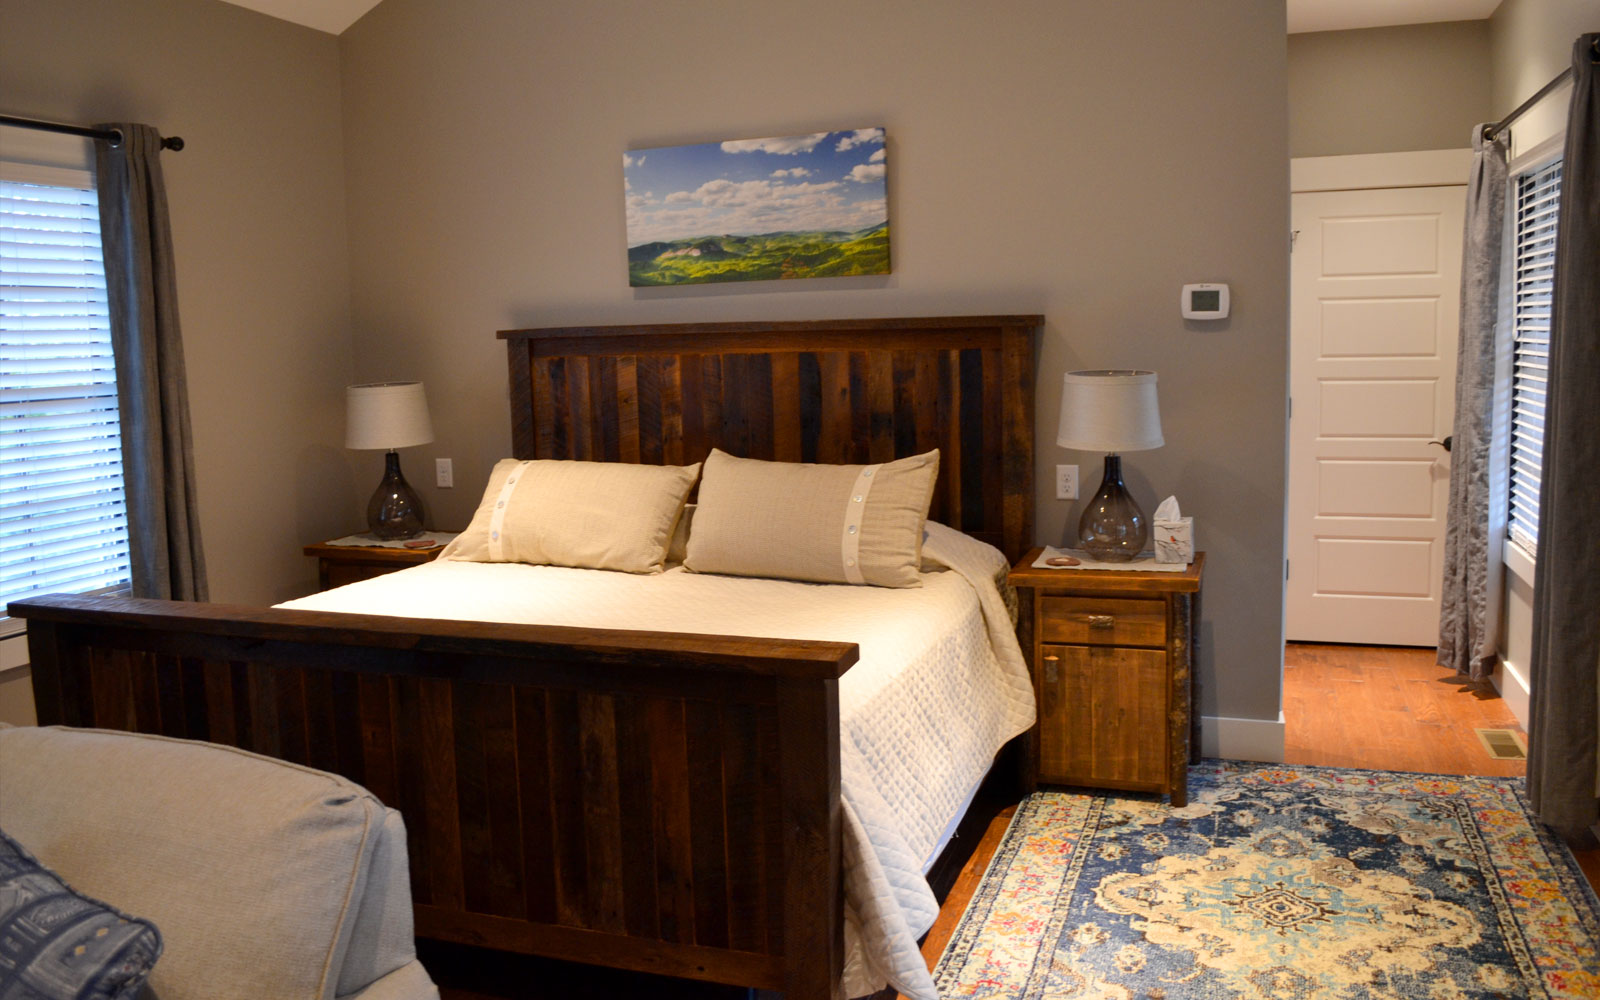 The Kitchen - Inn Rooms in Brevard North Carolina